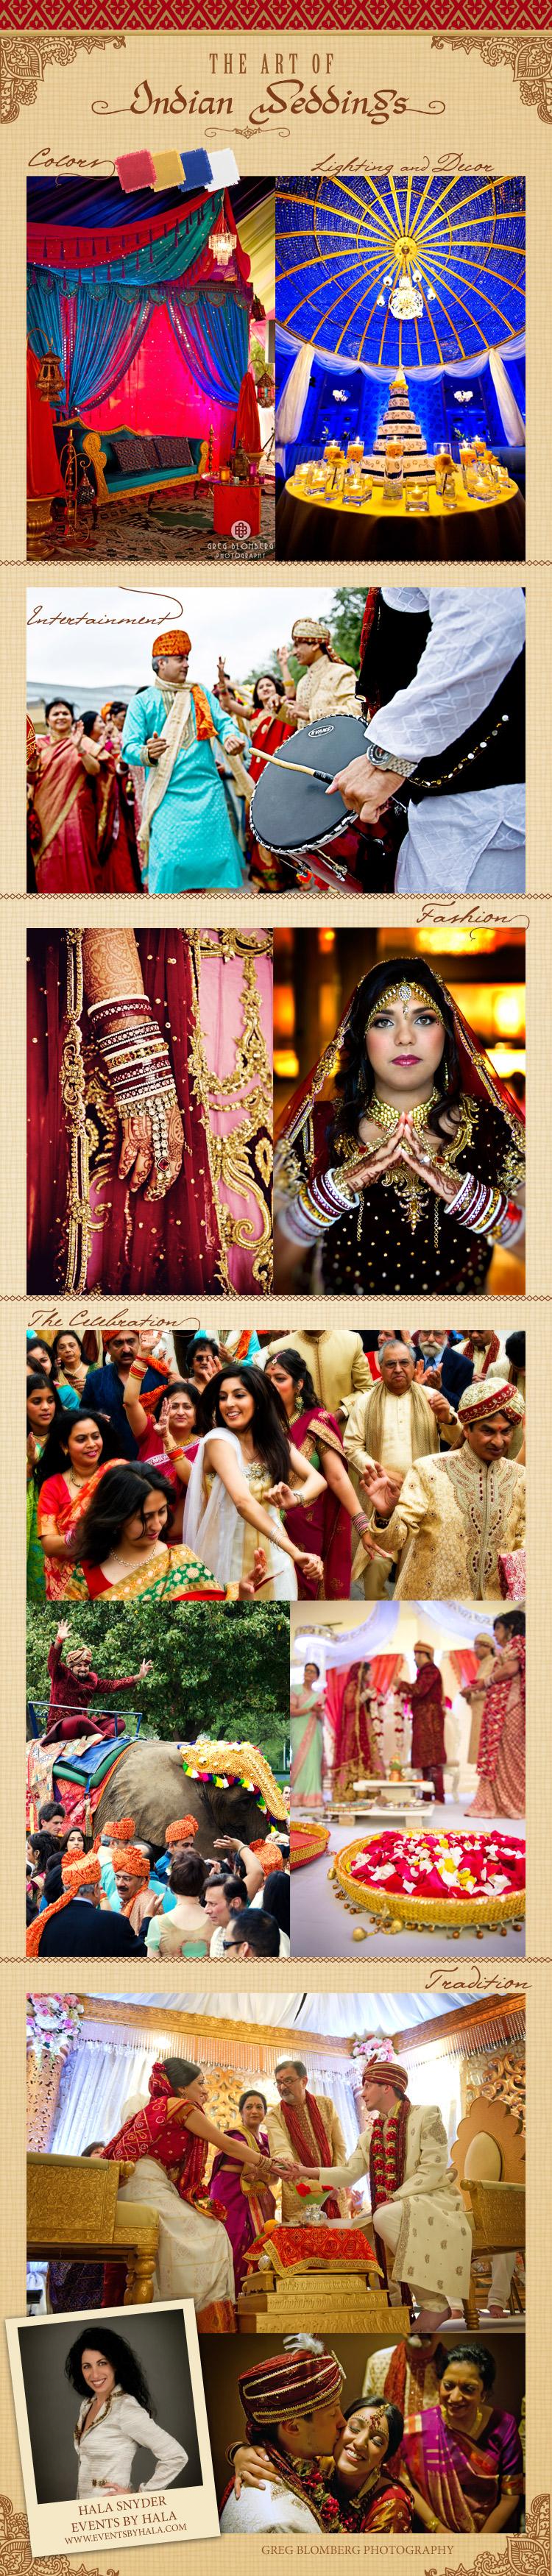 Dallas Fort Worth wedding planner Events by Hala: Indian Weddings